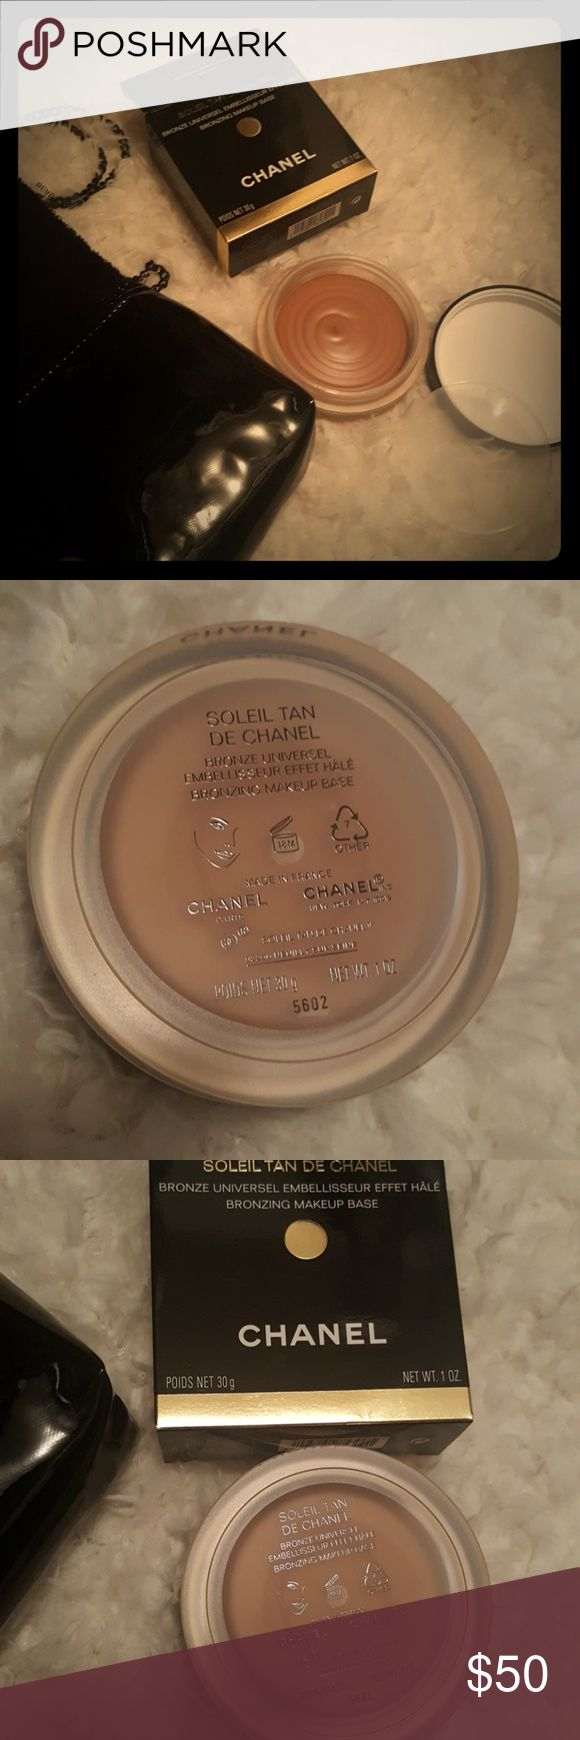 Brand new  Soleil Tan de Chanel Bronzer Brand new Soleil Tan de chanel bronzing makeup base CHANEL Makeup Bronzer